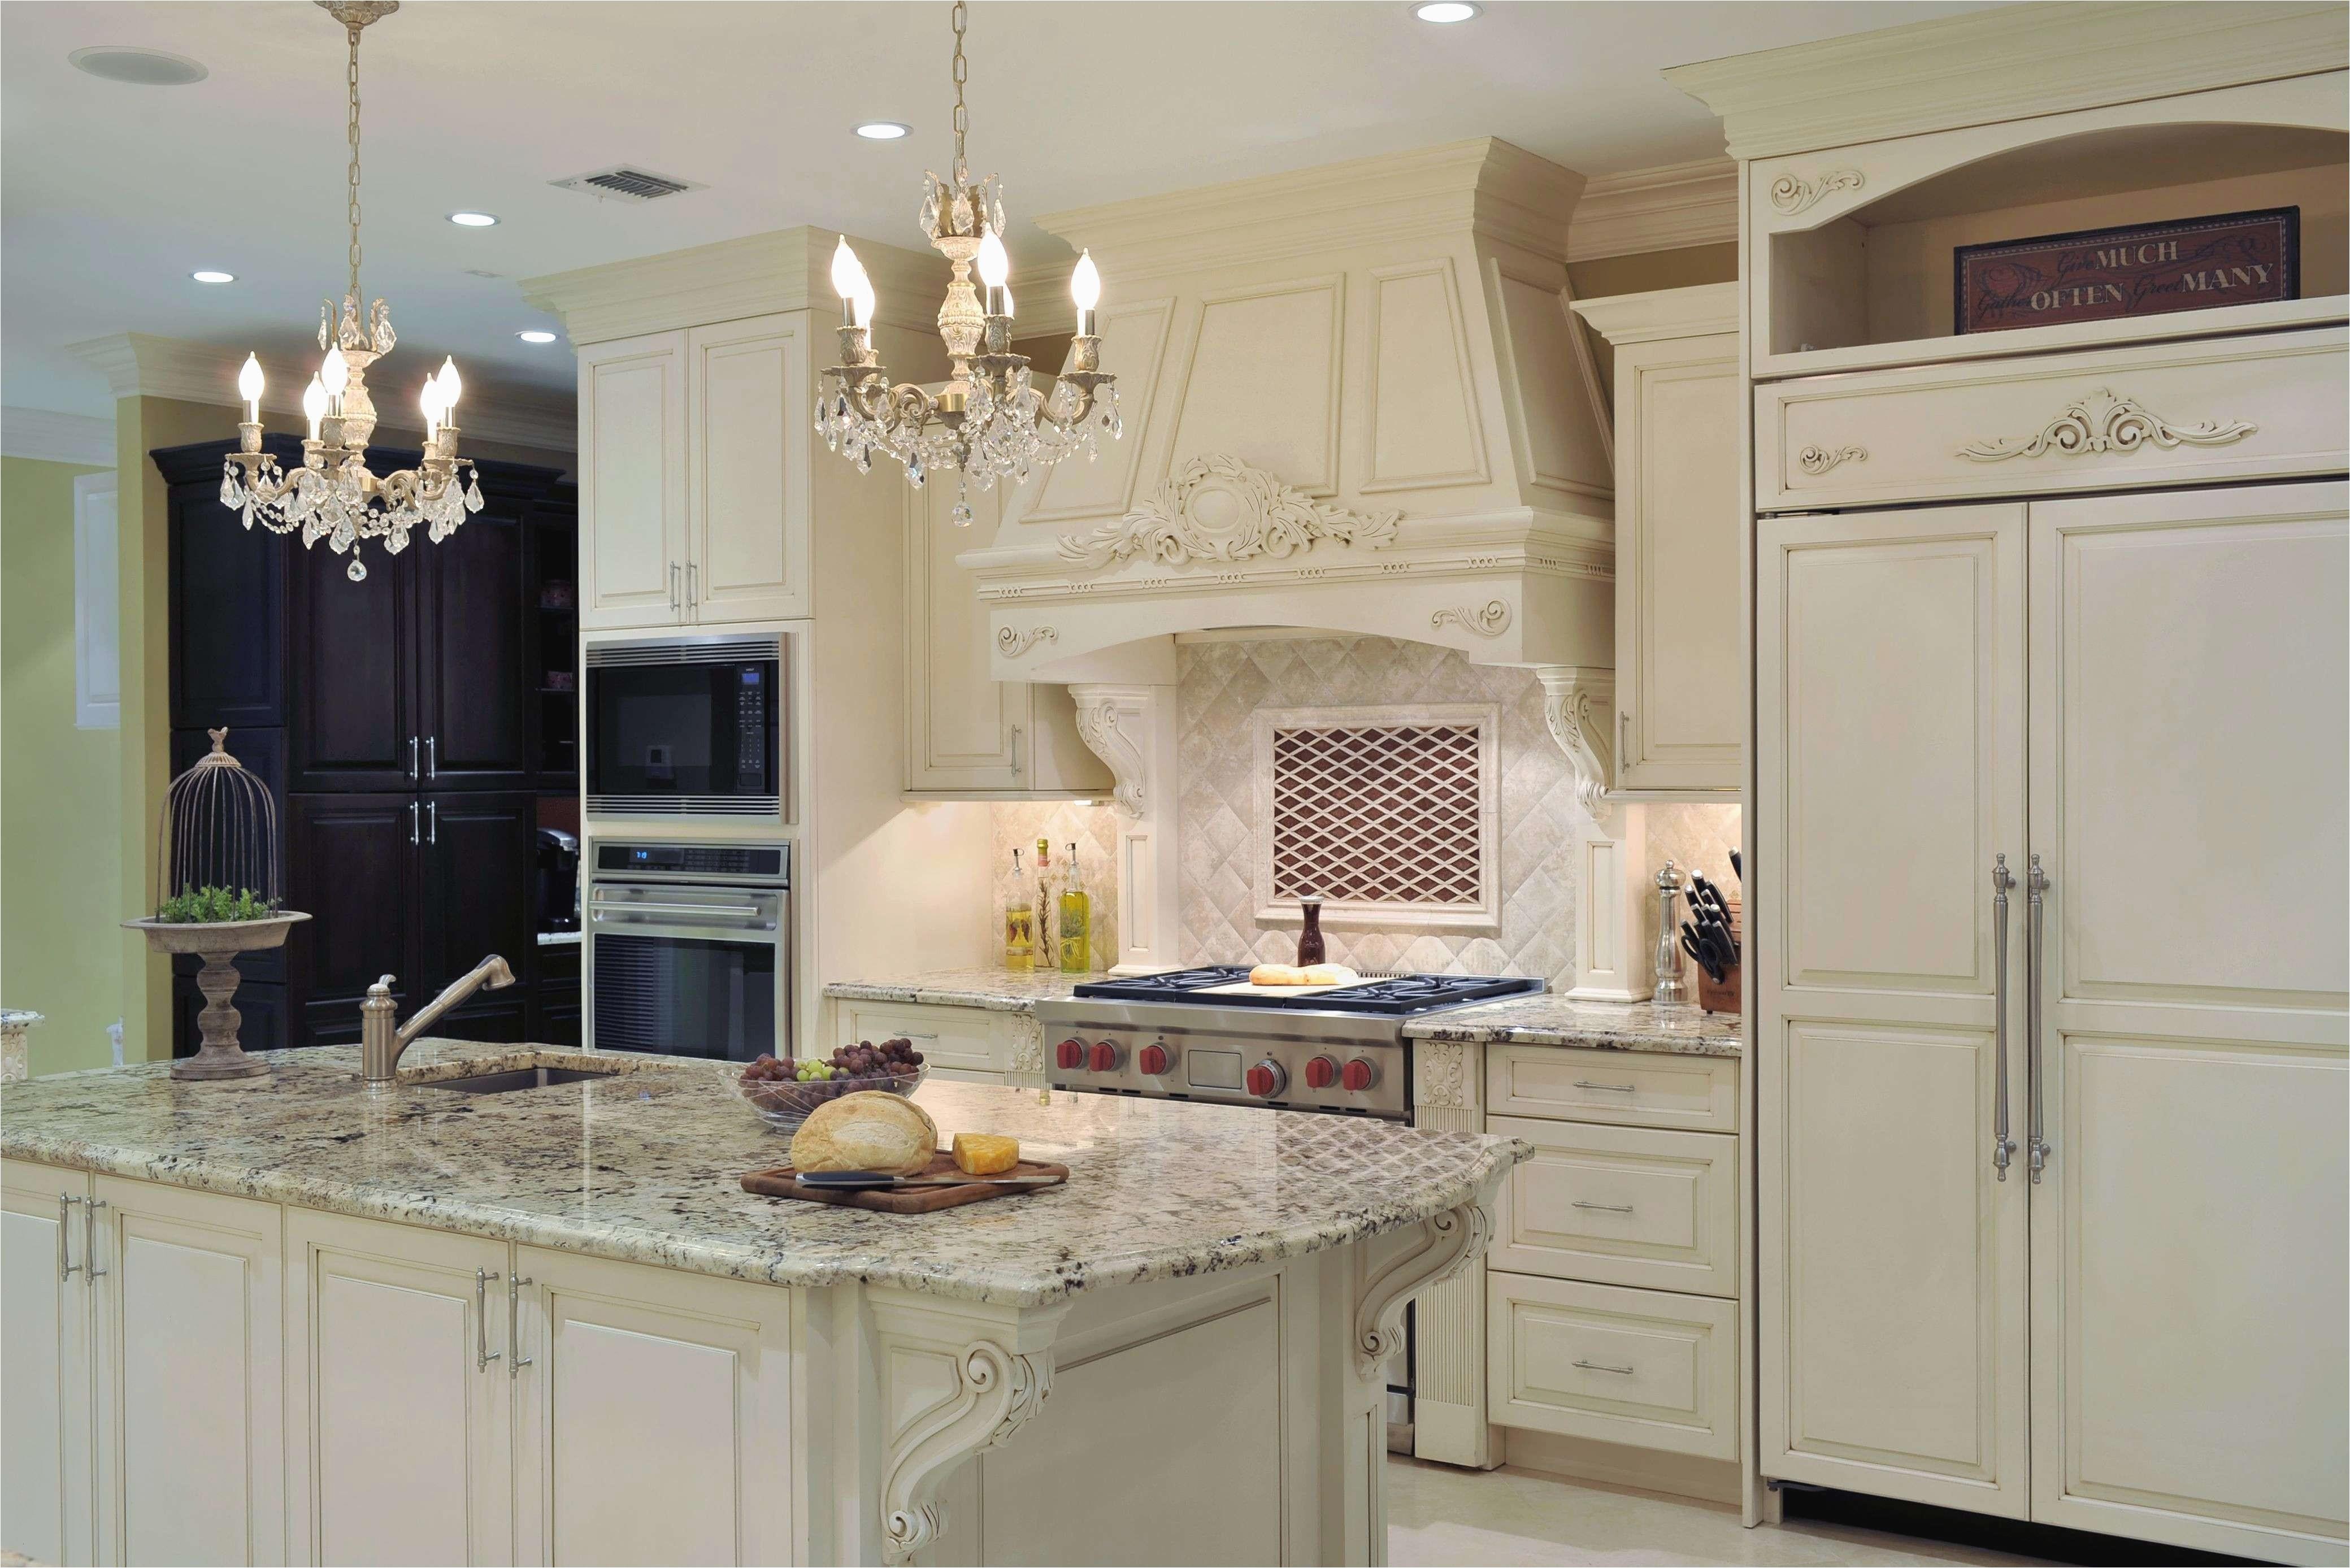 How To Do Kitchen Backsplash How Much Is Kitchen Cabinet Installation Lovely Kitchen Cabinet 0d